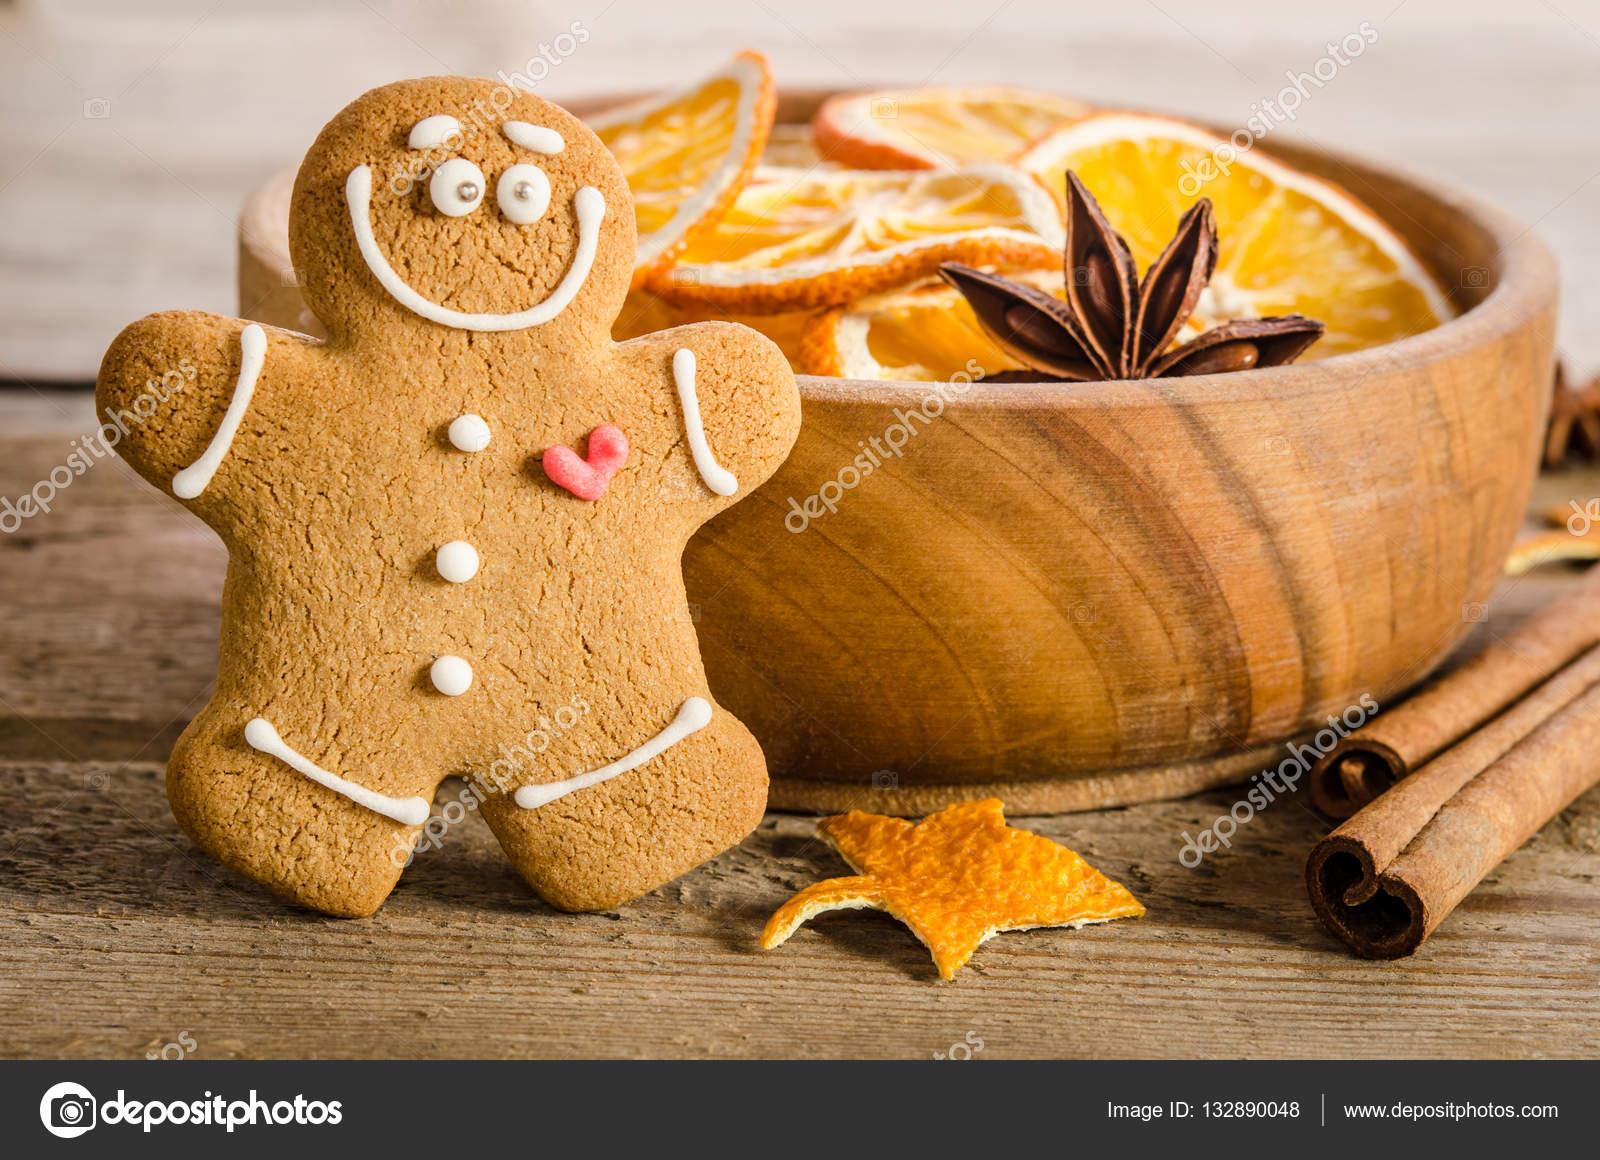 Decorazioni Natalizie Con Arance Essiccate.Decorazione Di Natale Con Arance Essiccate E Pan Di Zenzero Foto